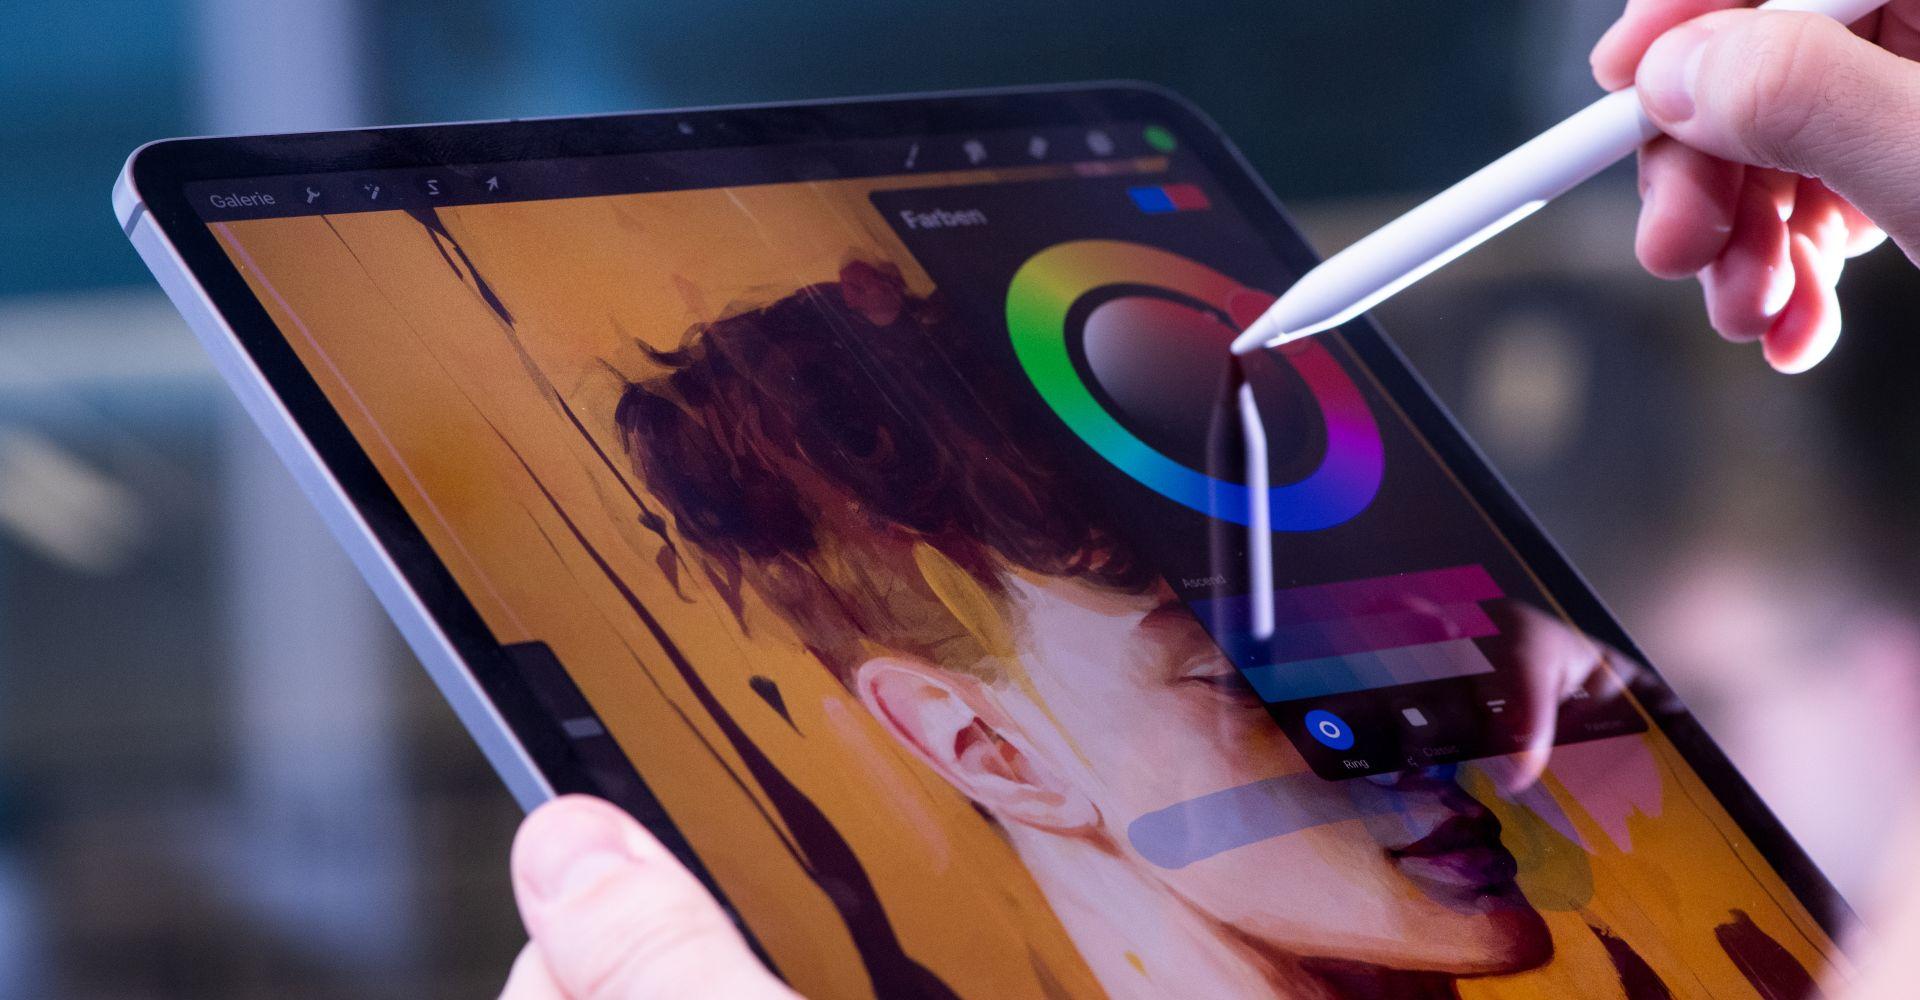 ipad pro 2020 das soll das neue apple tablet bieten. Black Bedroom Furniture Sets. Home Design Ideas